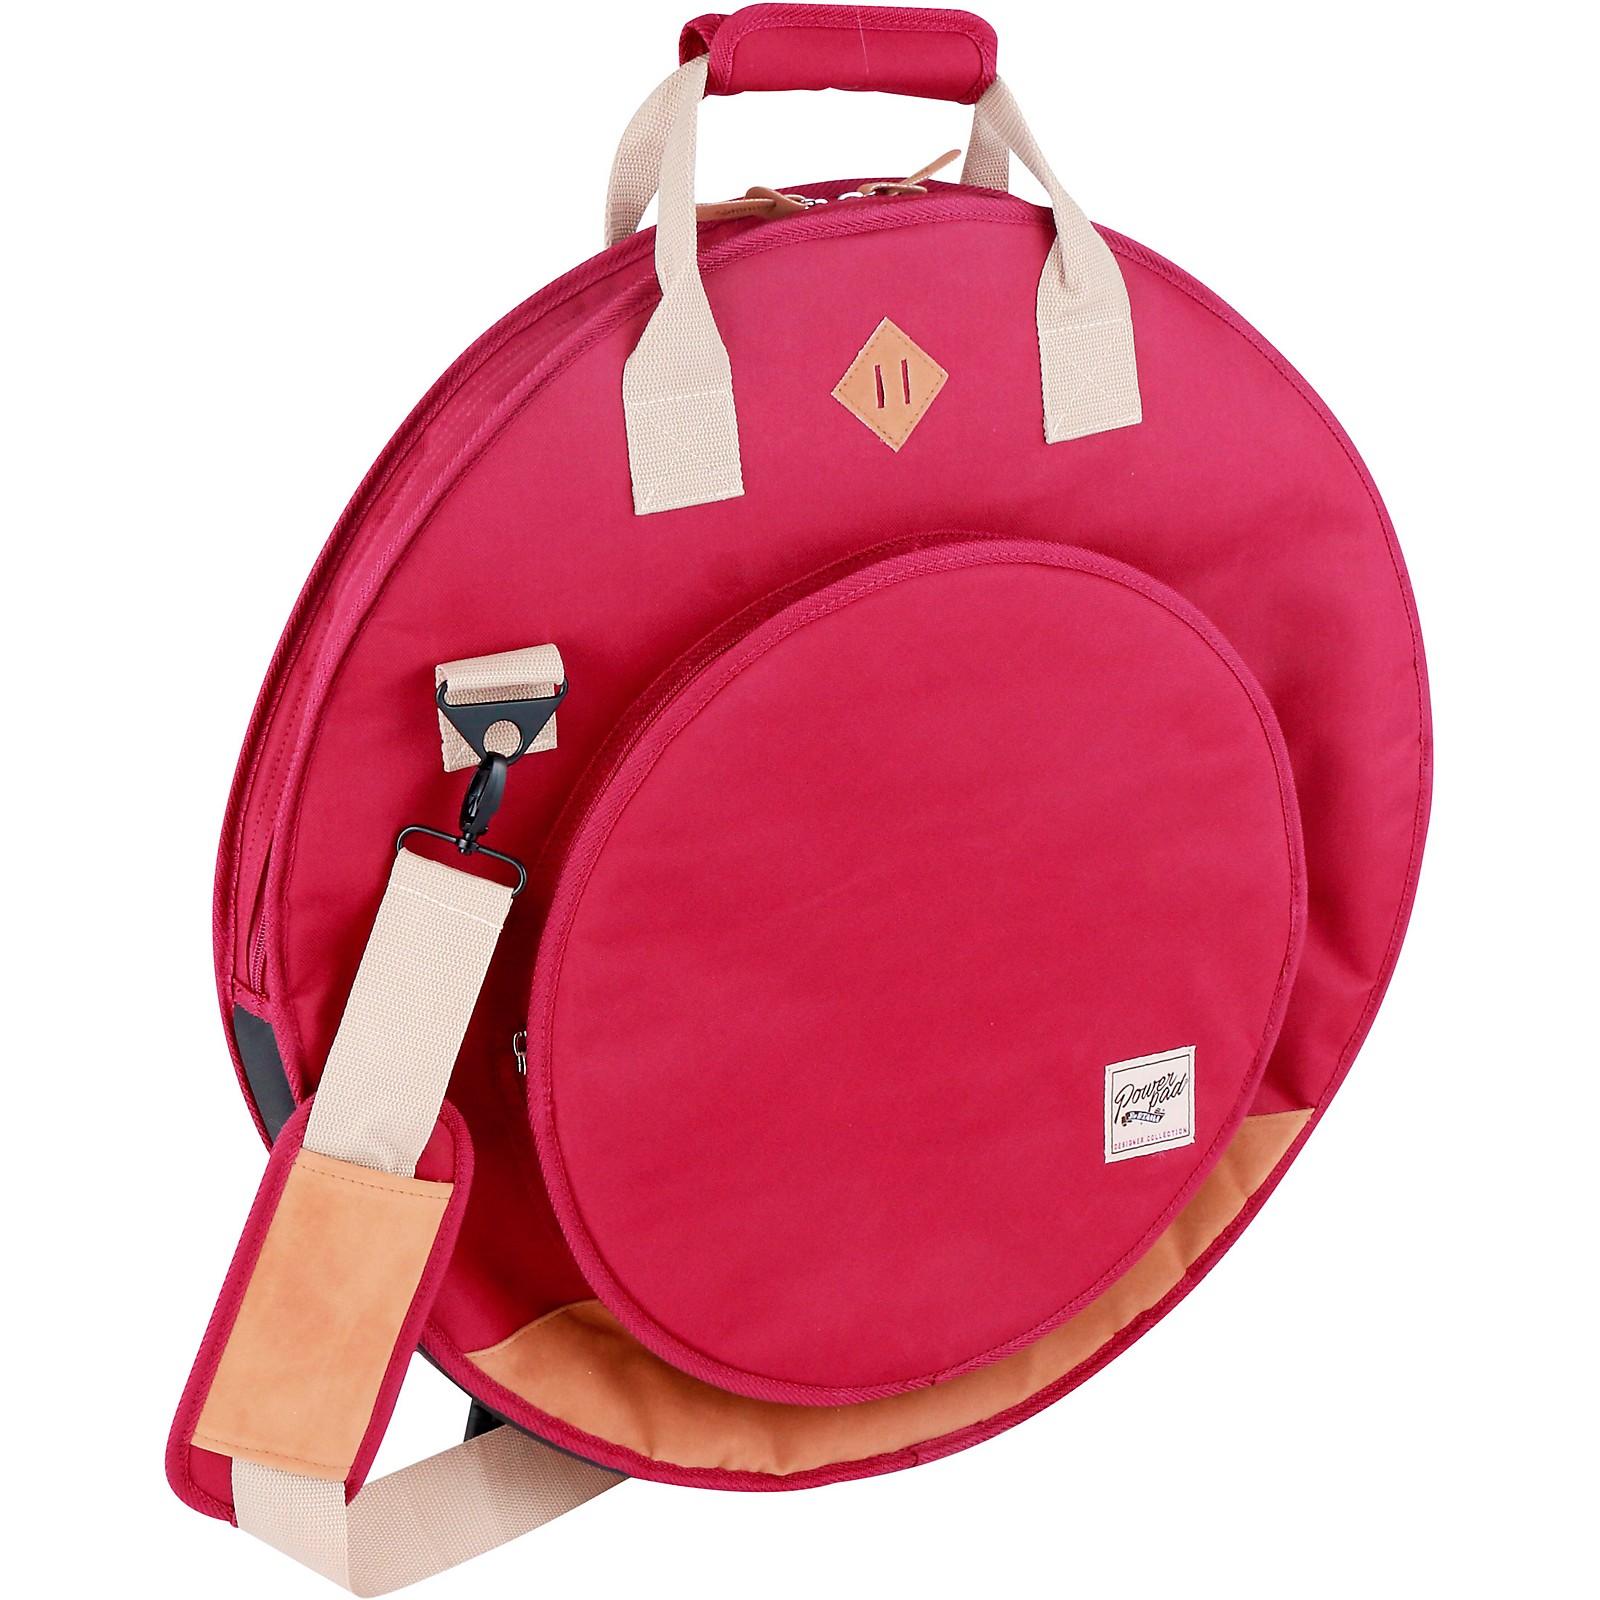 TAMA Powerpad Cymbal Bag